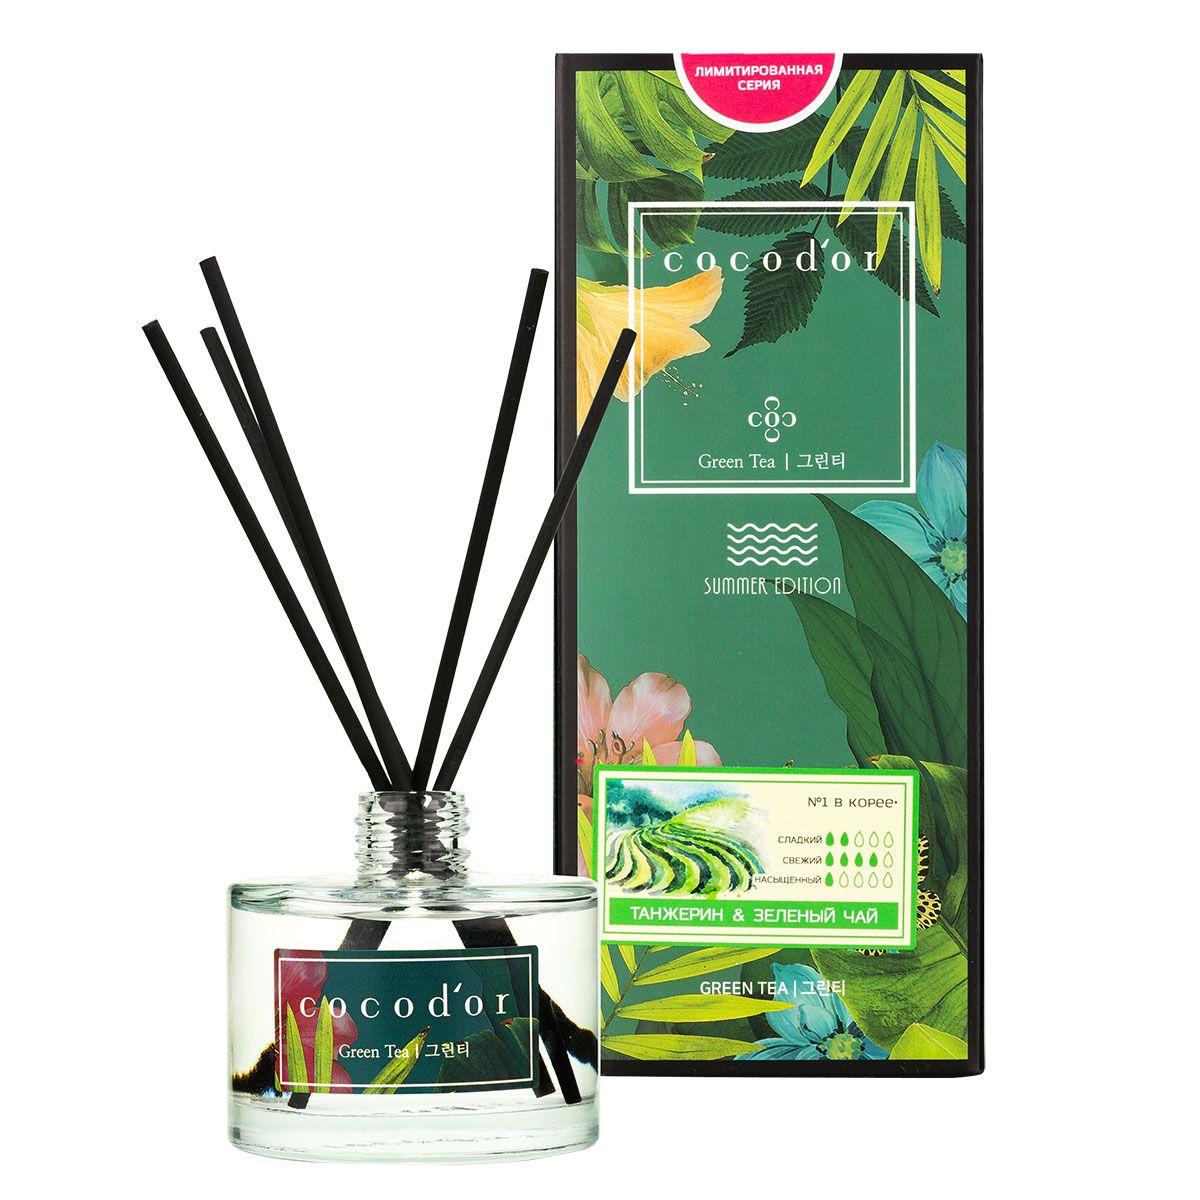 Арома-диффузор для помещений  Мароканский танжерин и зеленый чай  - 200 мл.